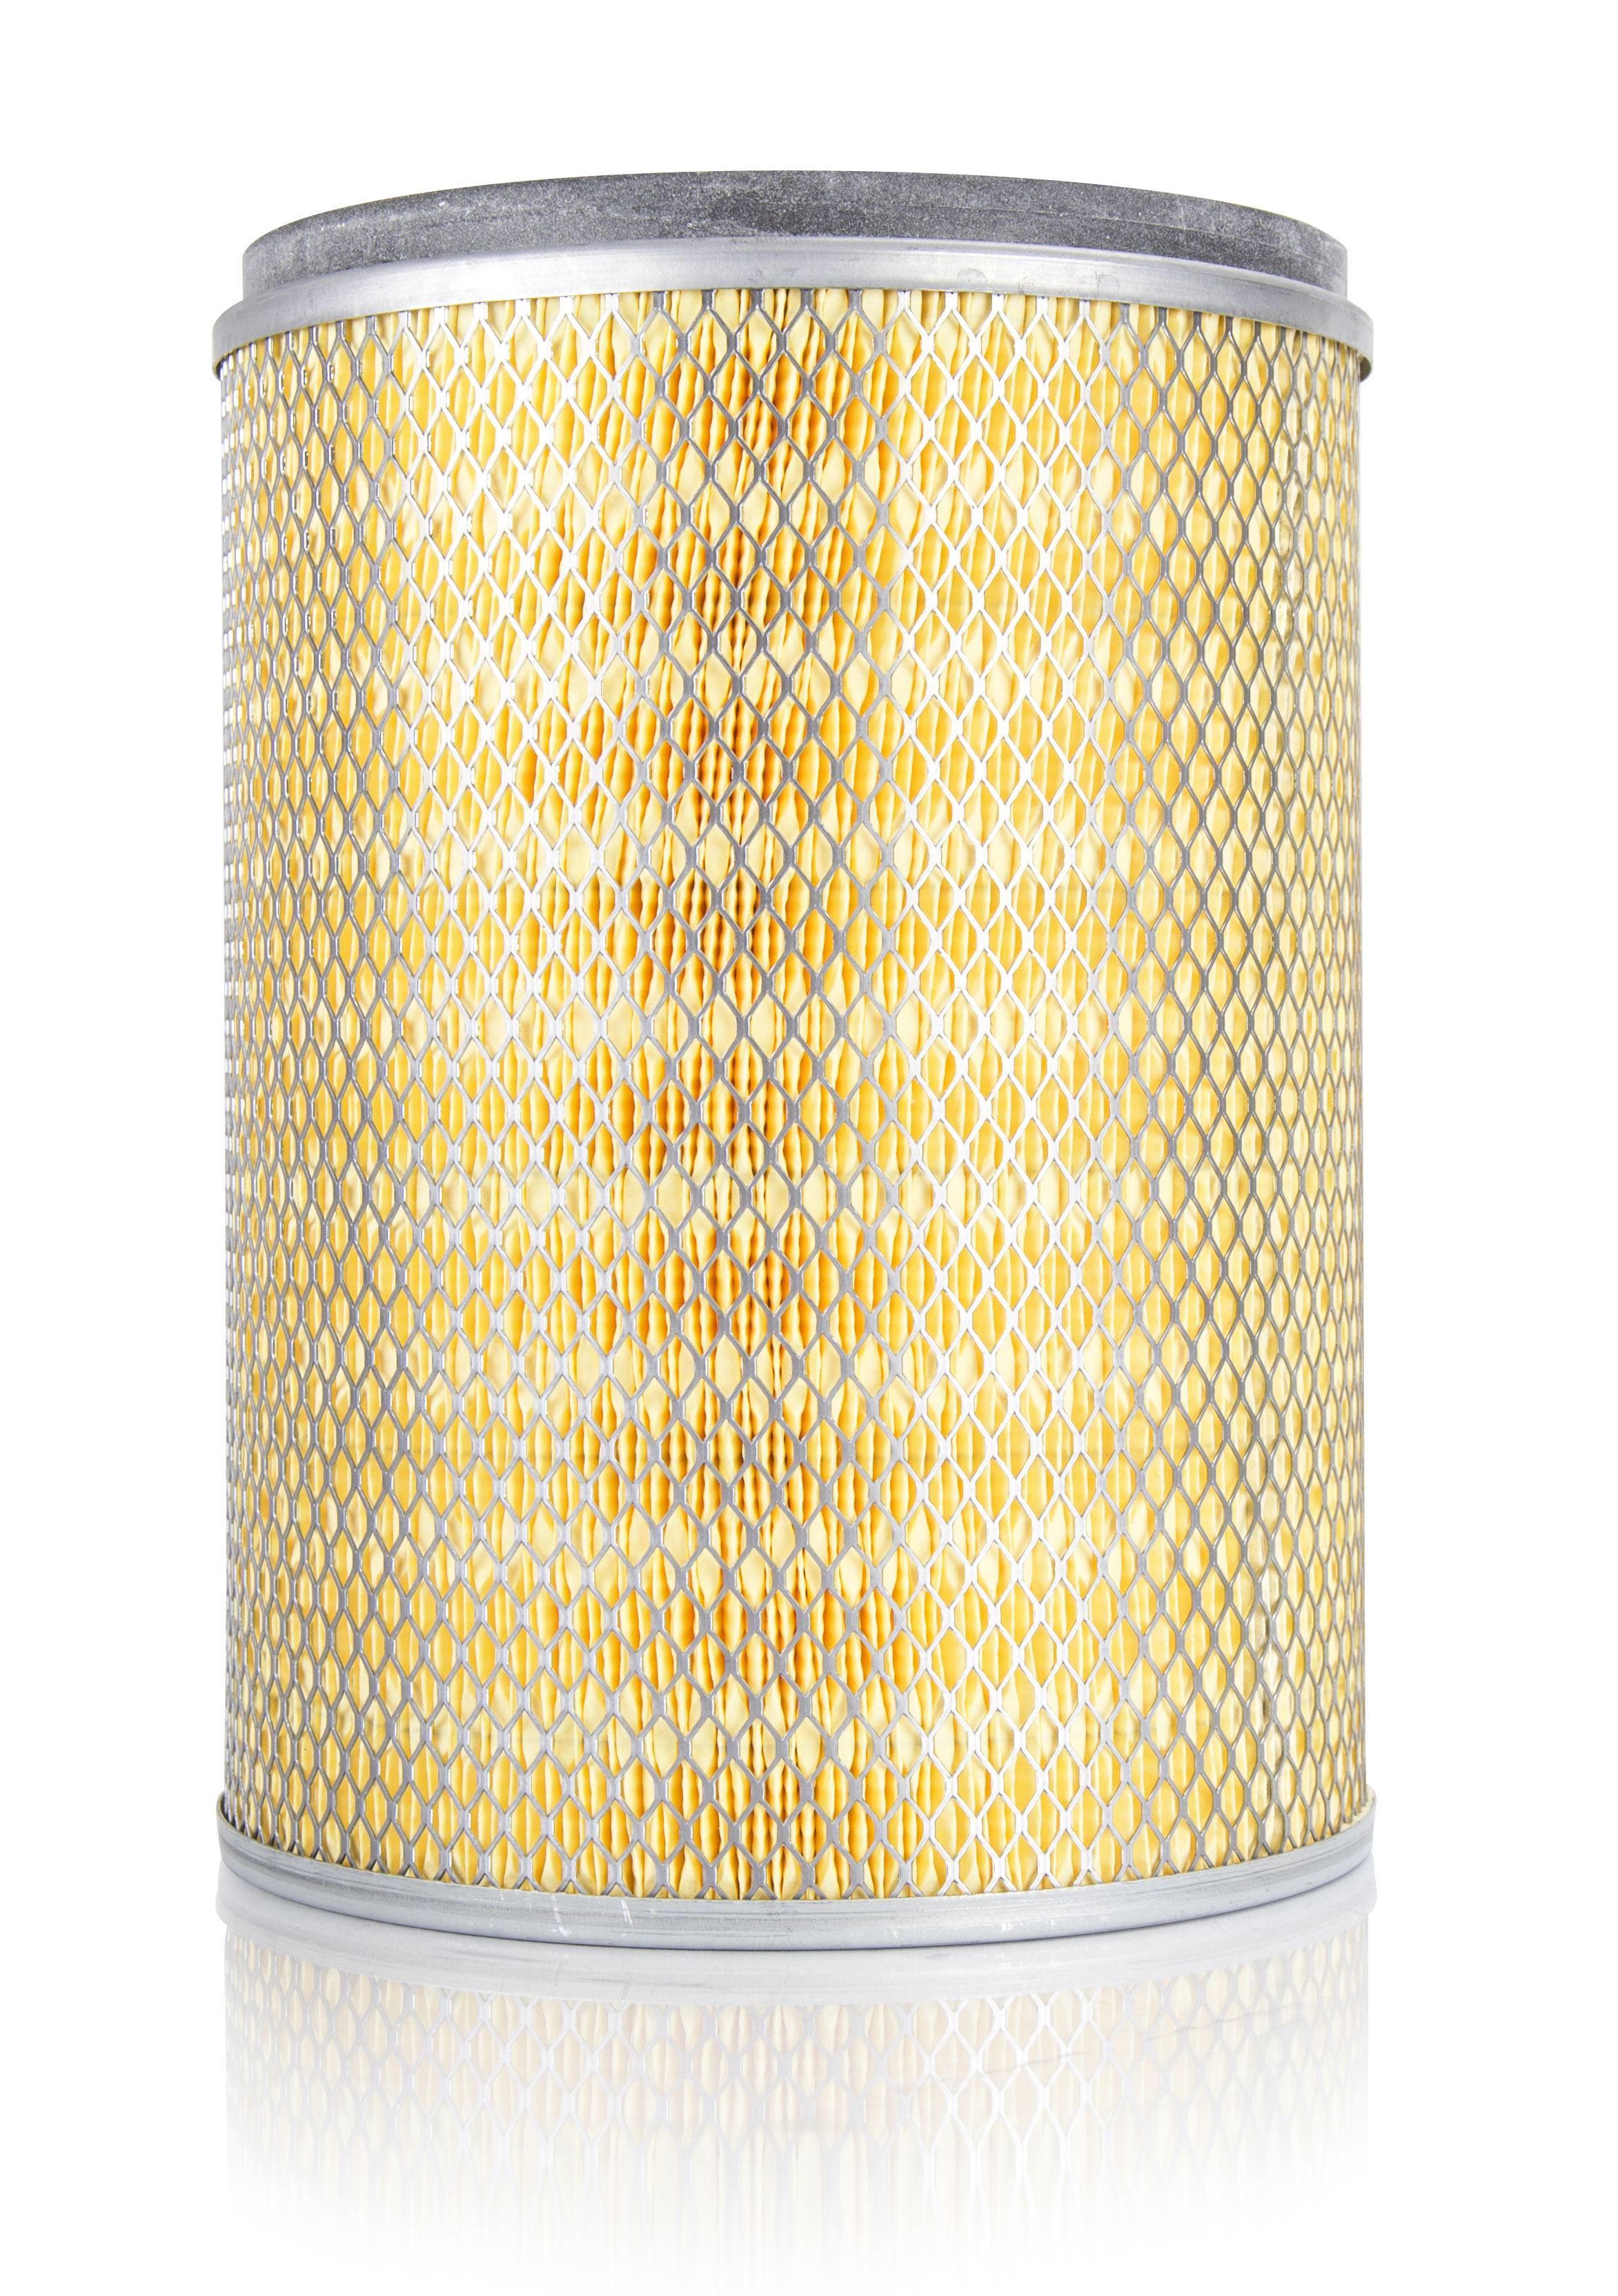 Luber-finer MXM Nano Air Filters